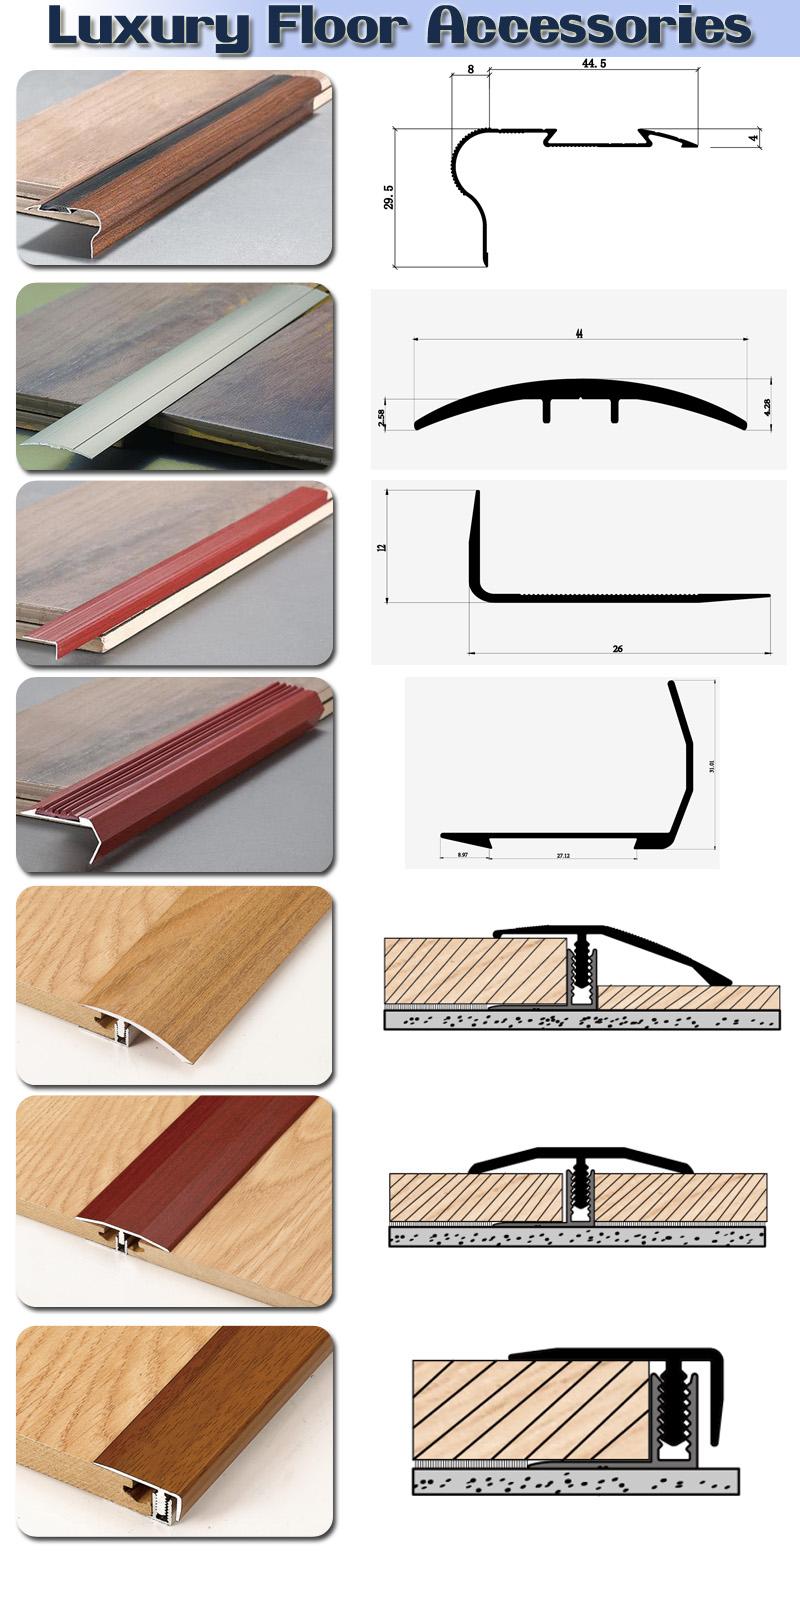 Aluminum profile anodize anti slip stair nosing floor edging aluminum profile anodize anti slip stair nosing floor edgingceramic tile trim dailygadgetfo Choice Image